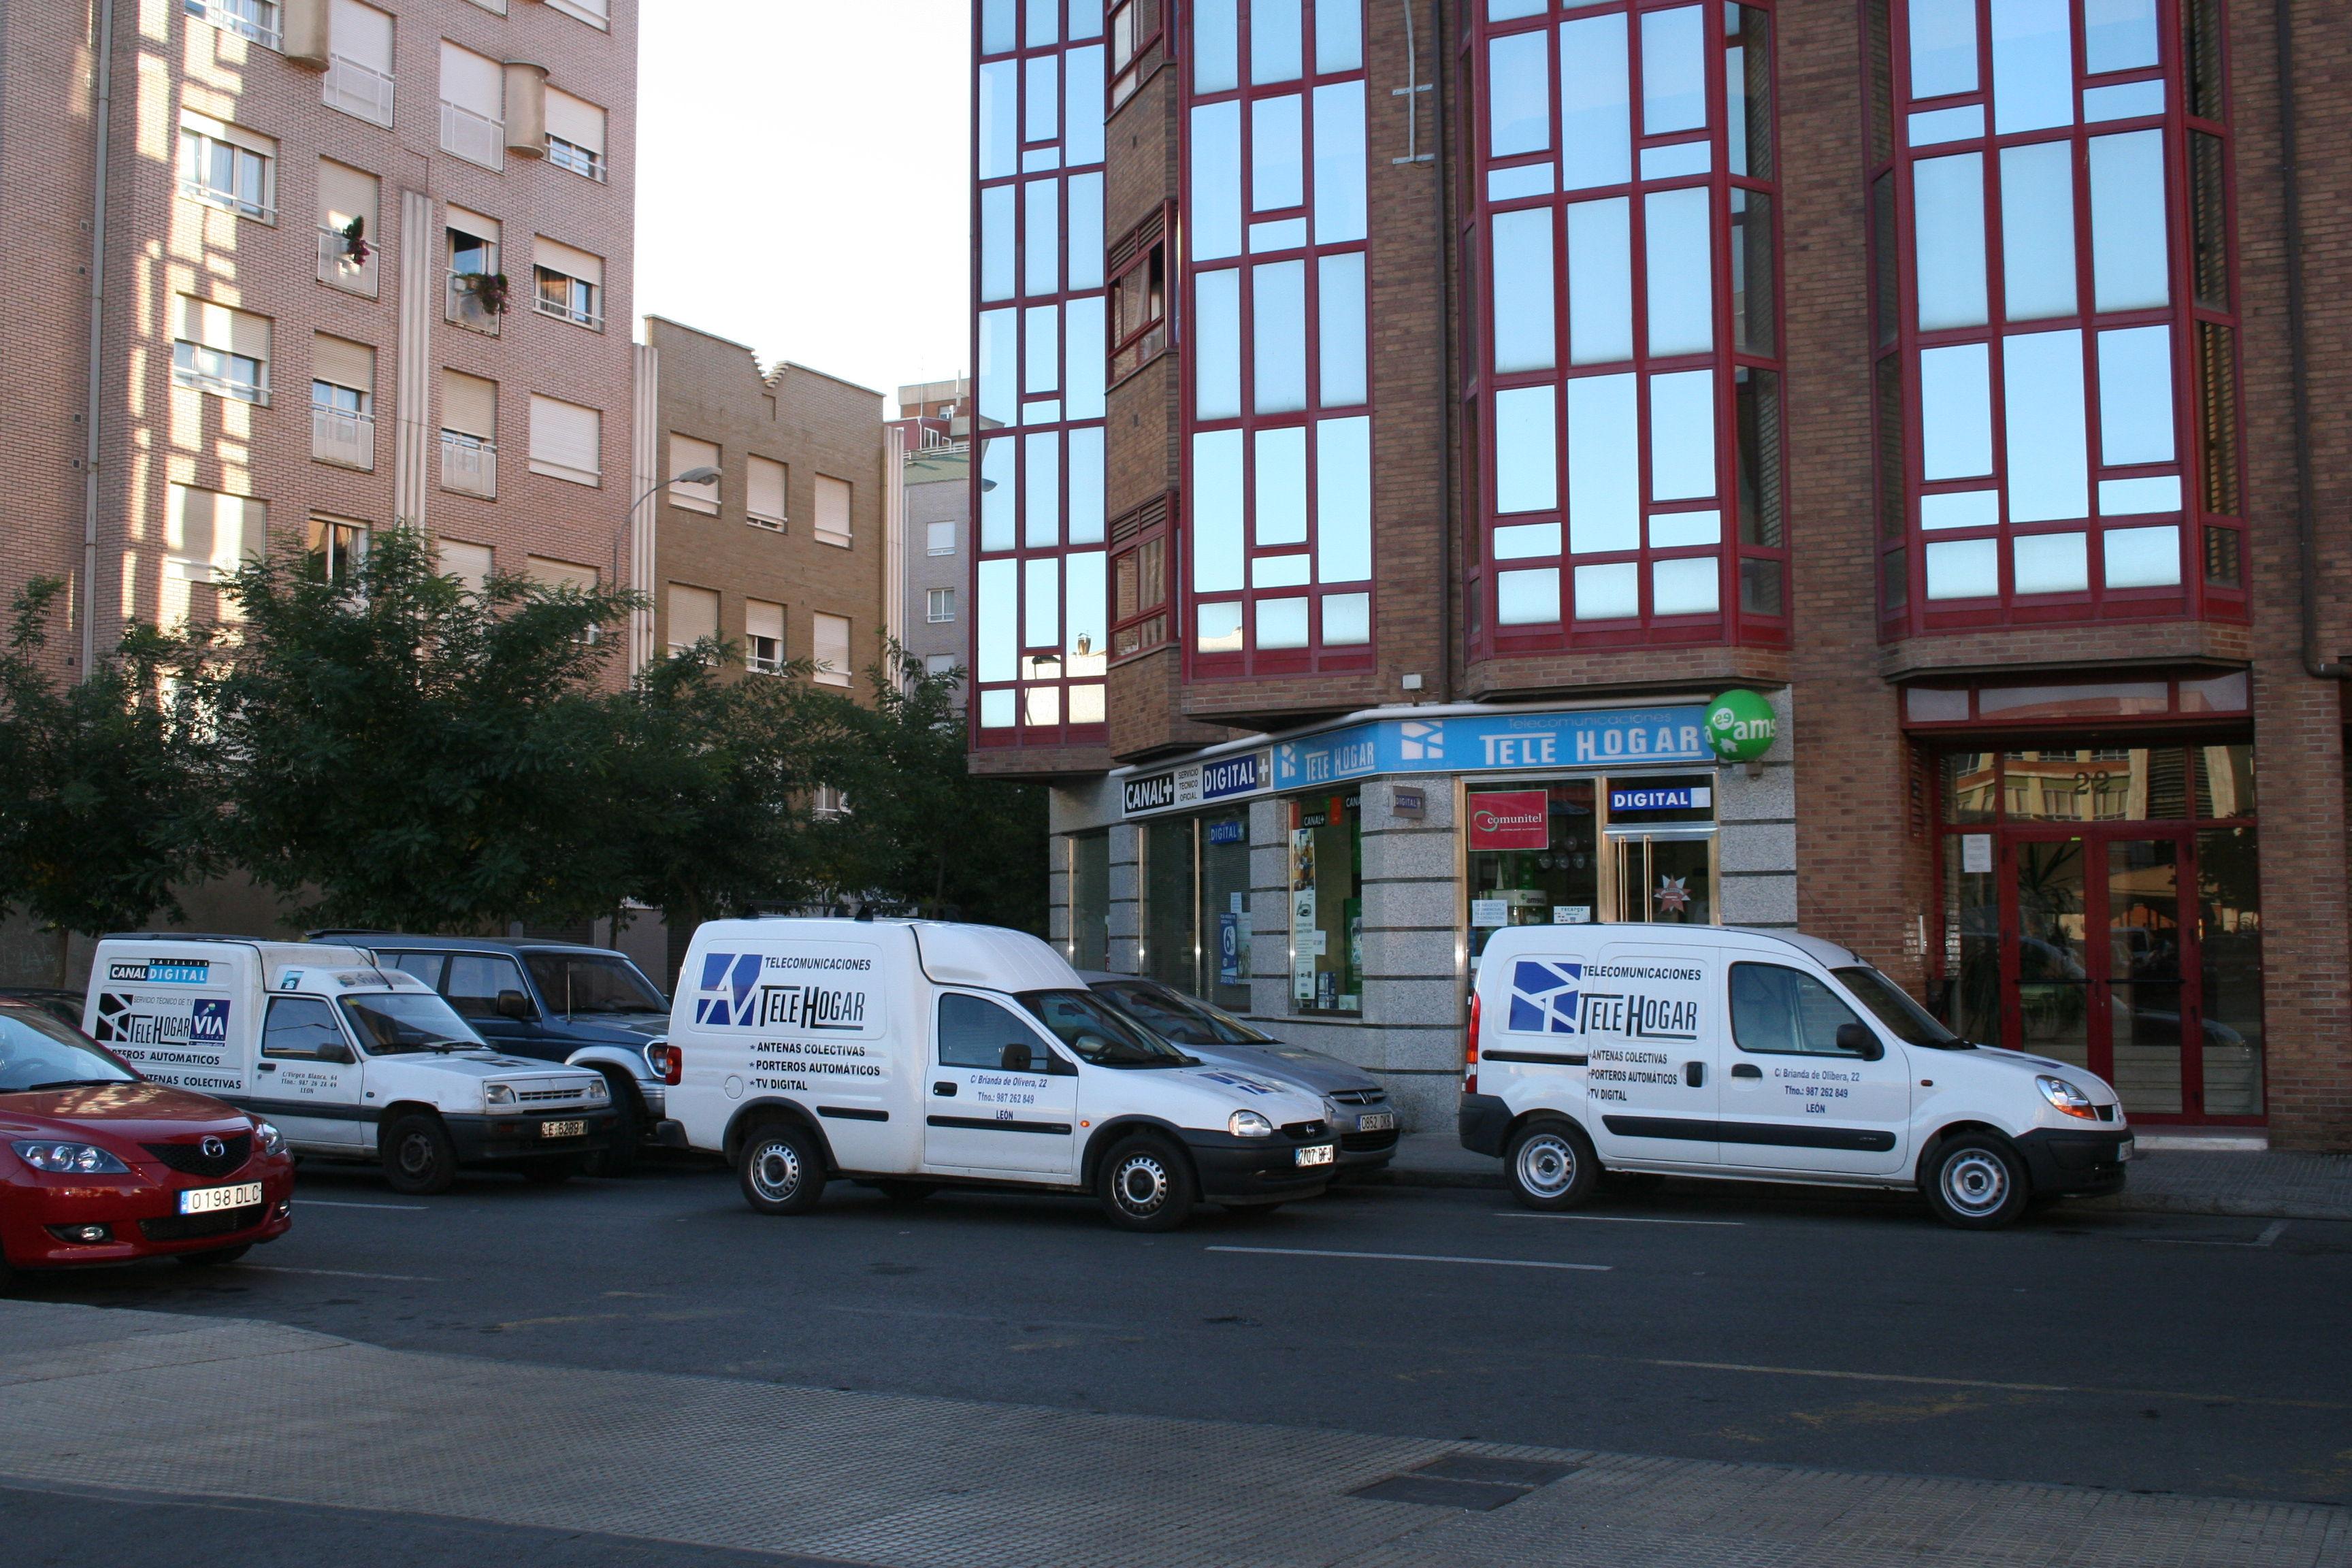 Foto 5 de Antenas en León   TeleHogar León, S.L.